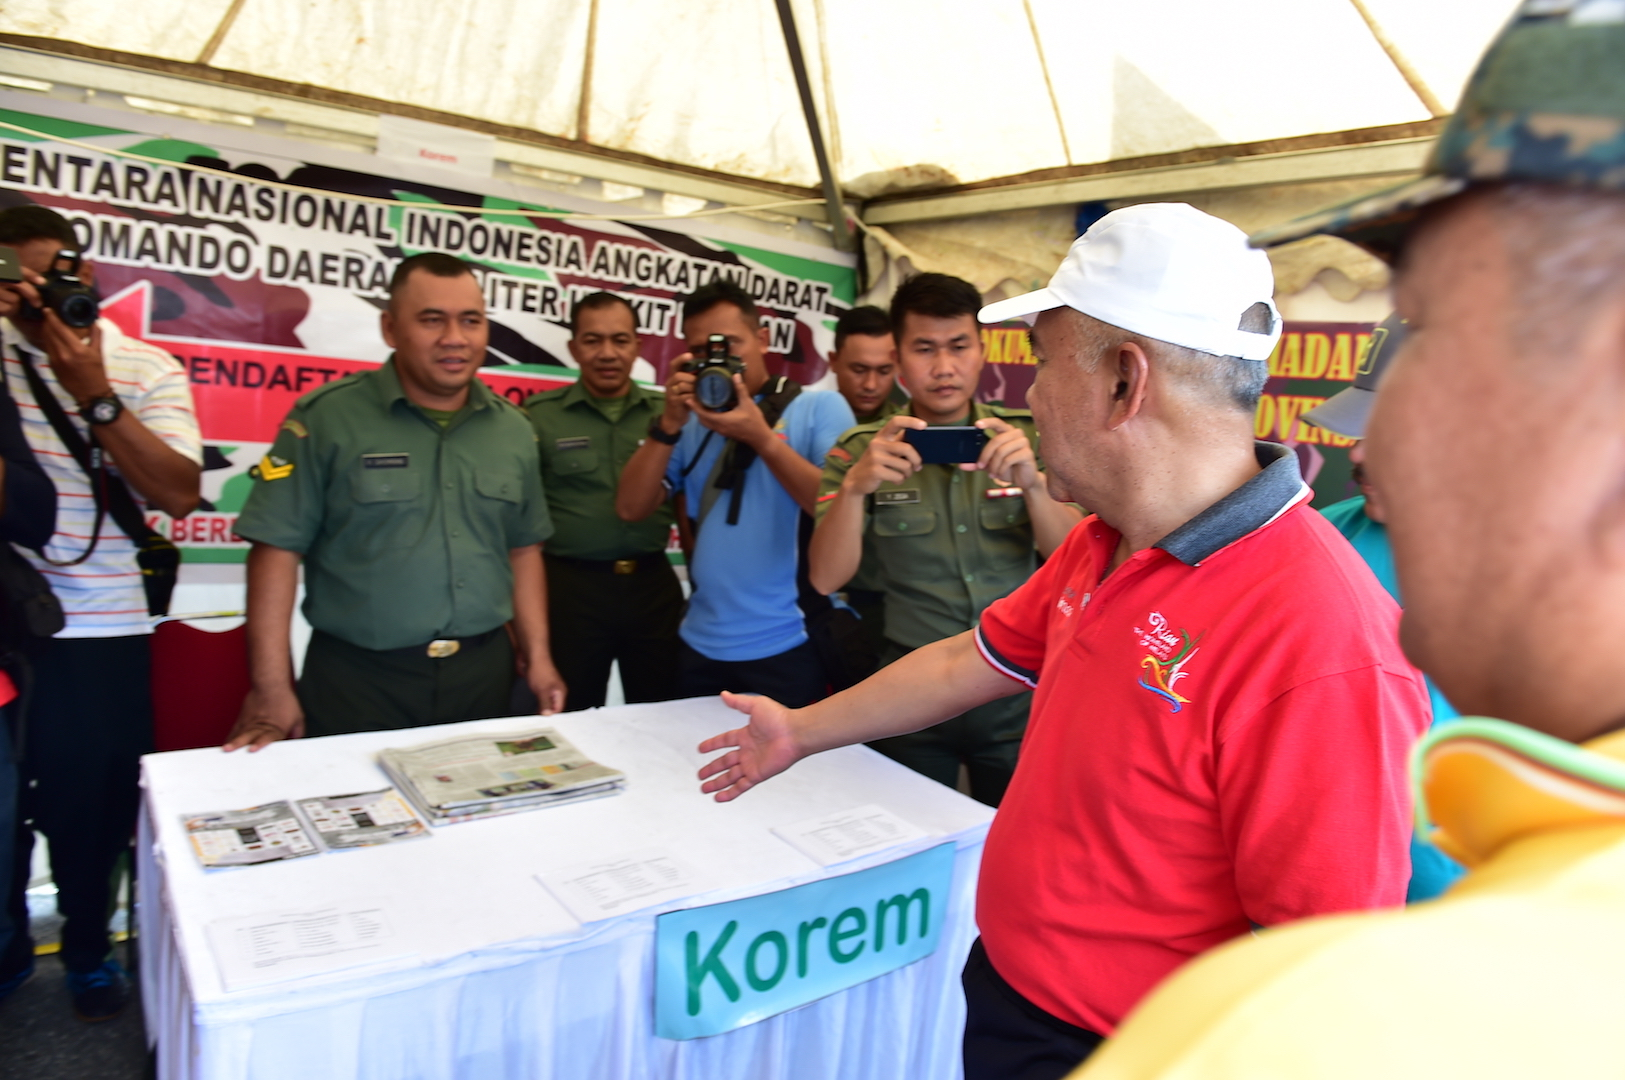 Gubri saat meninjau stand pameran Korem 031_WB pada Riau Pustaka Lingkungan Dunia Yayasan Komunal Riau di Gor Tribuana